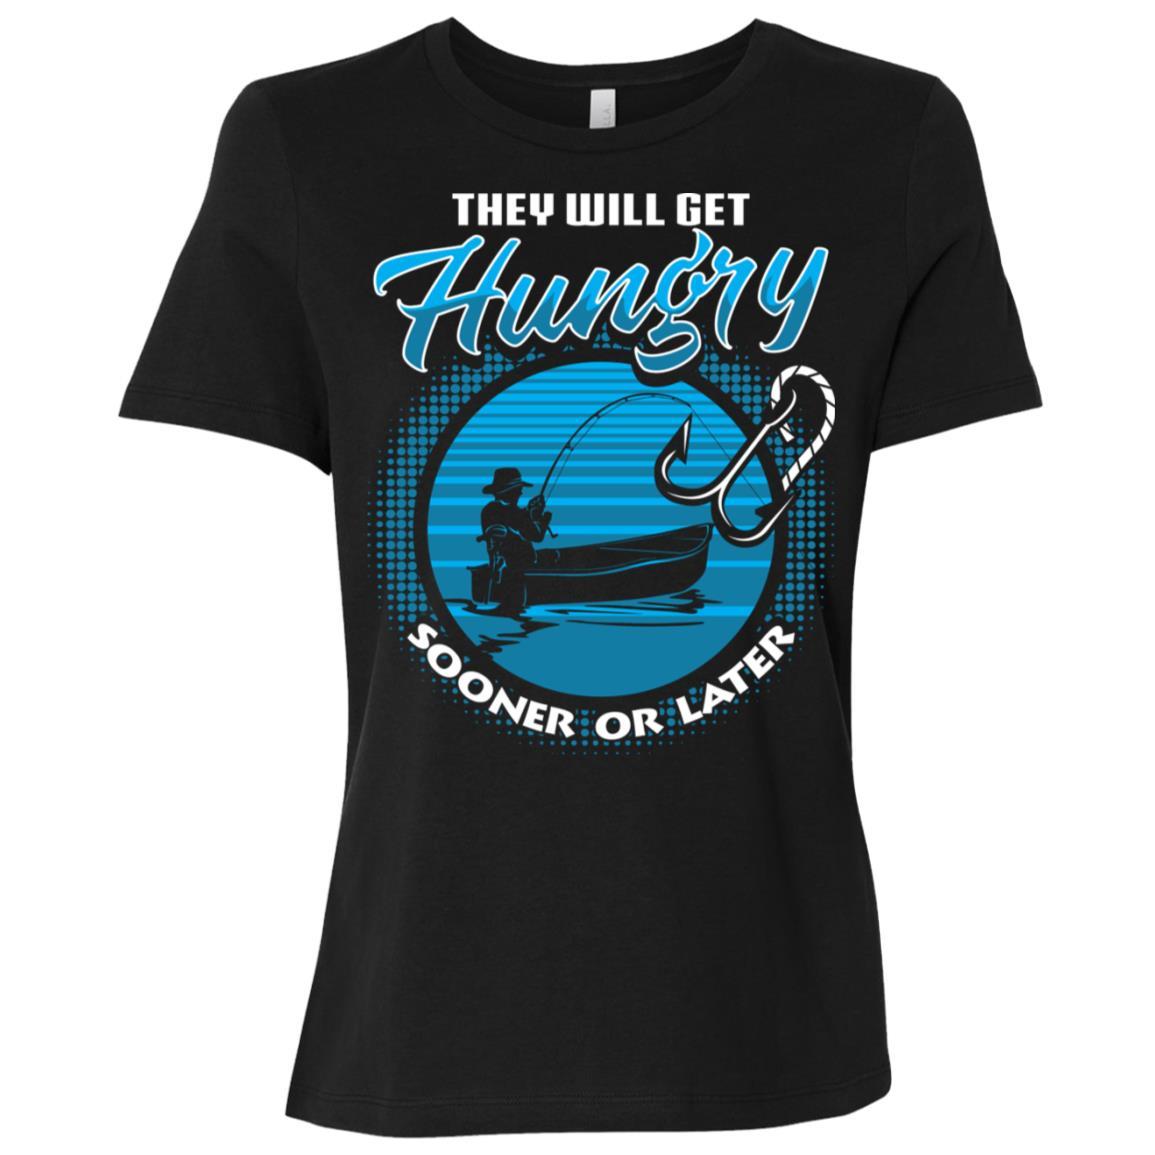 Funny Fishings for Men Women Kids Fisherman Women Short Sleeve T-Shirt